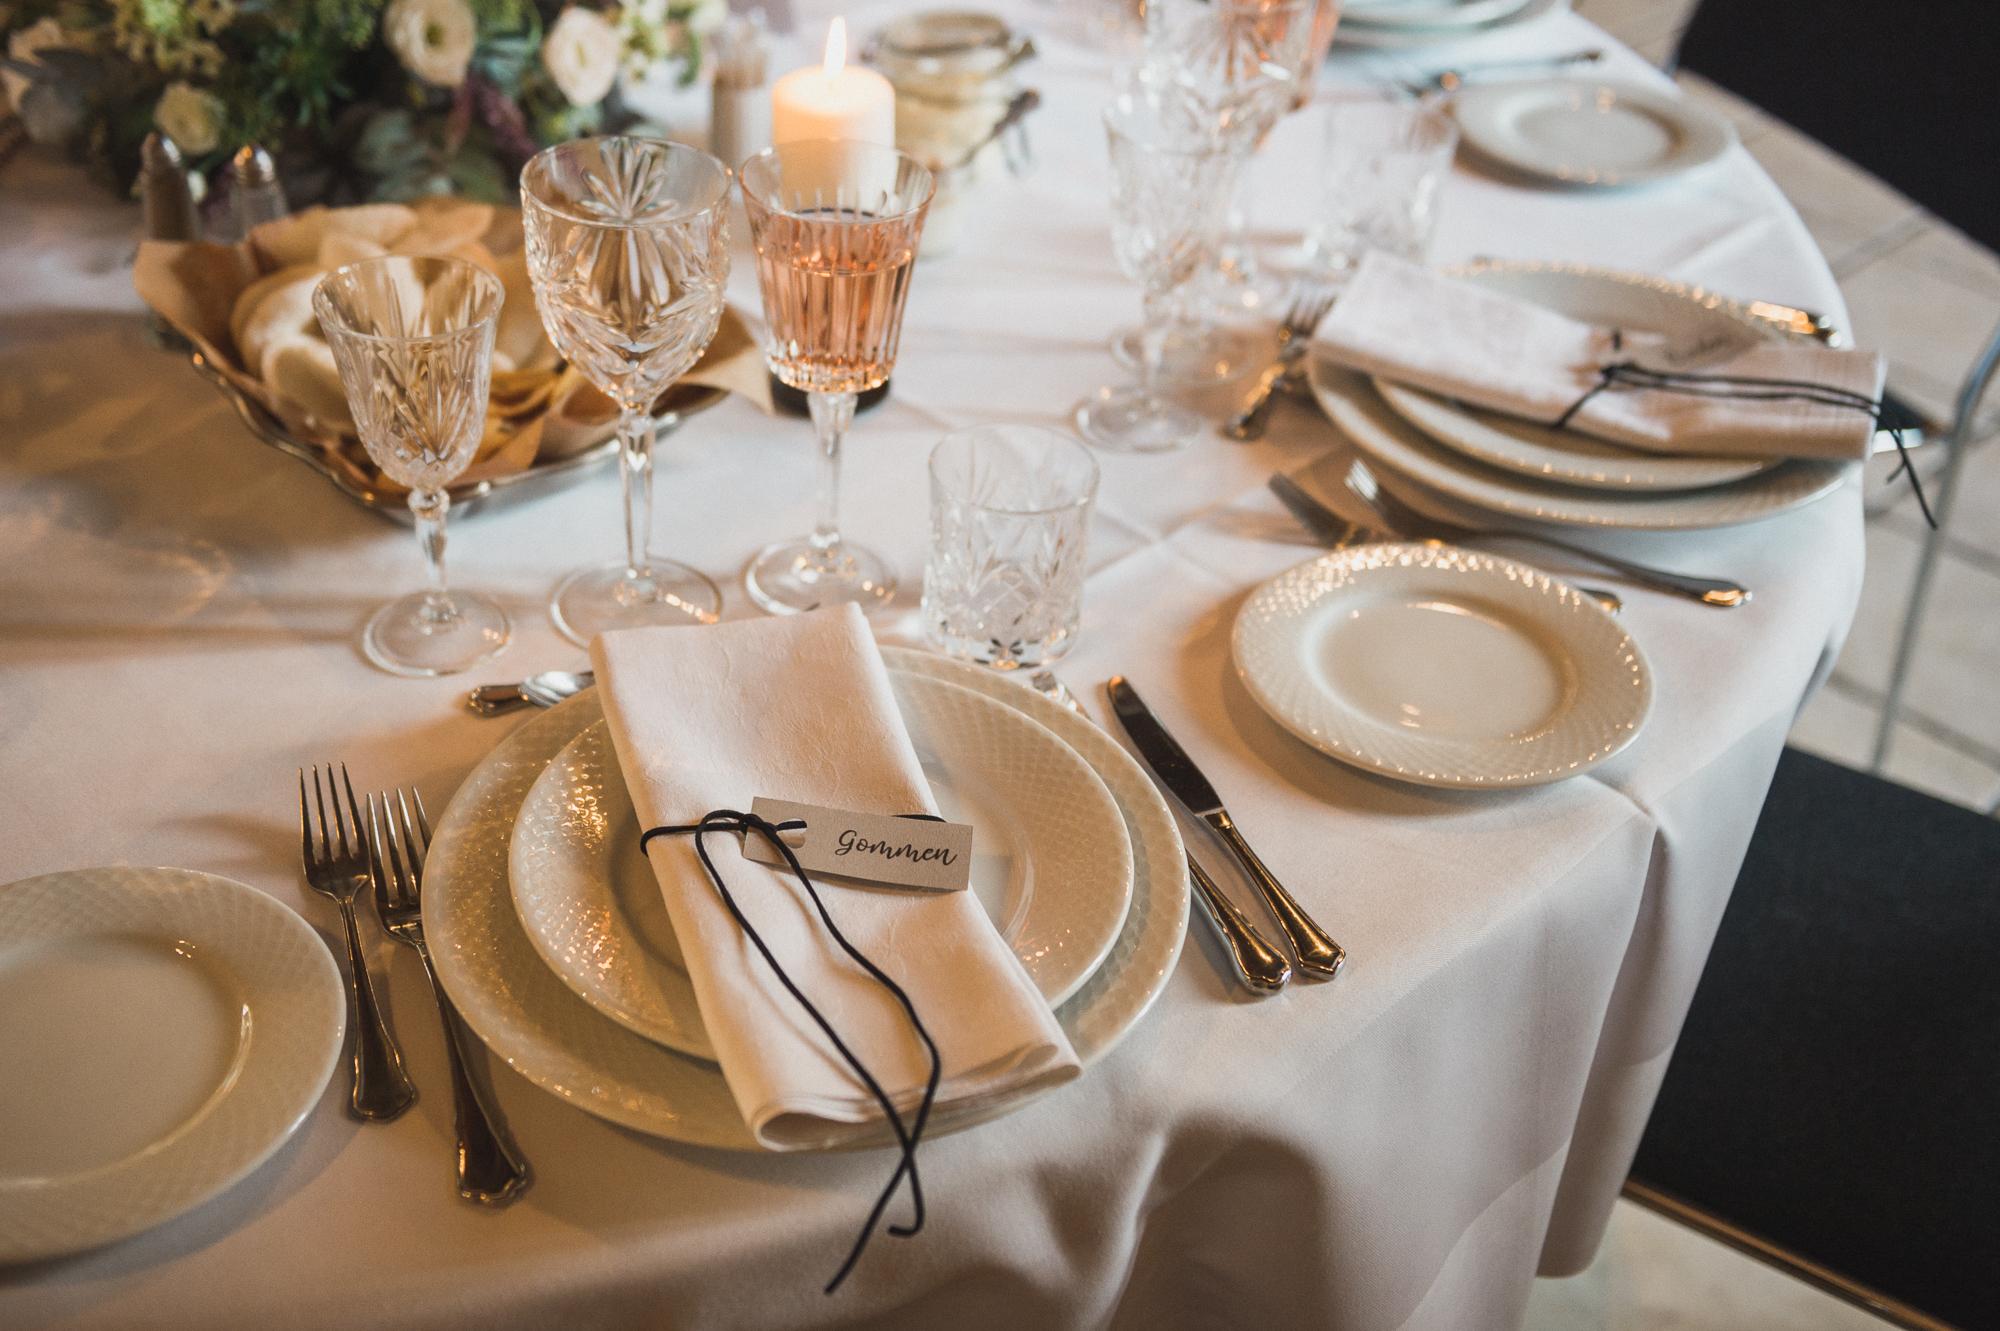 Servietter til bryllup